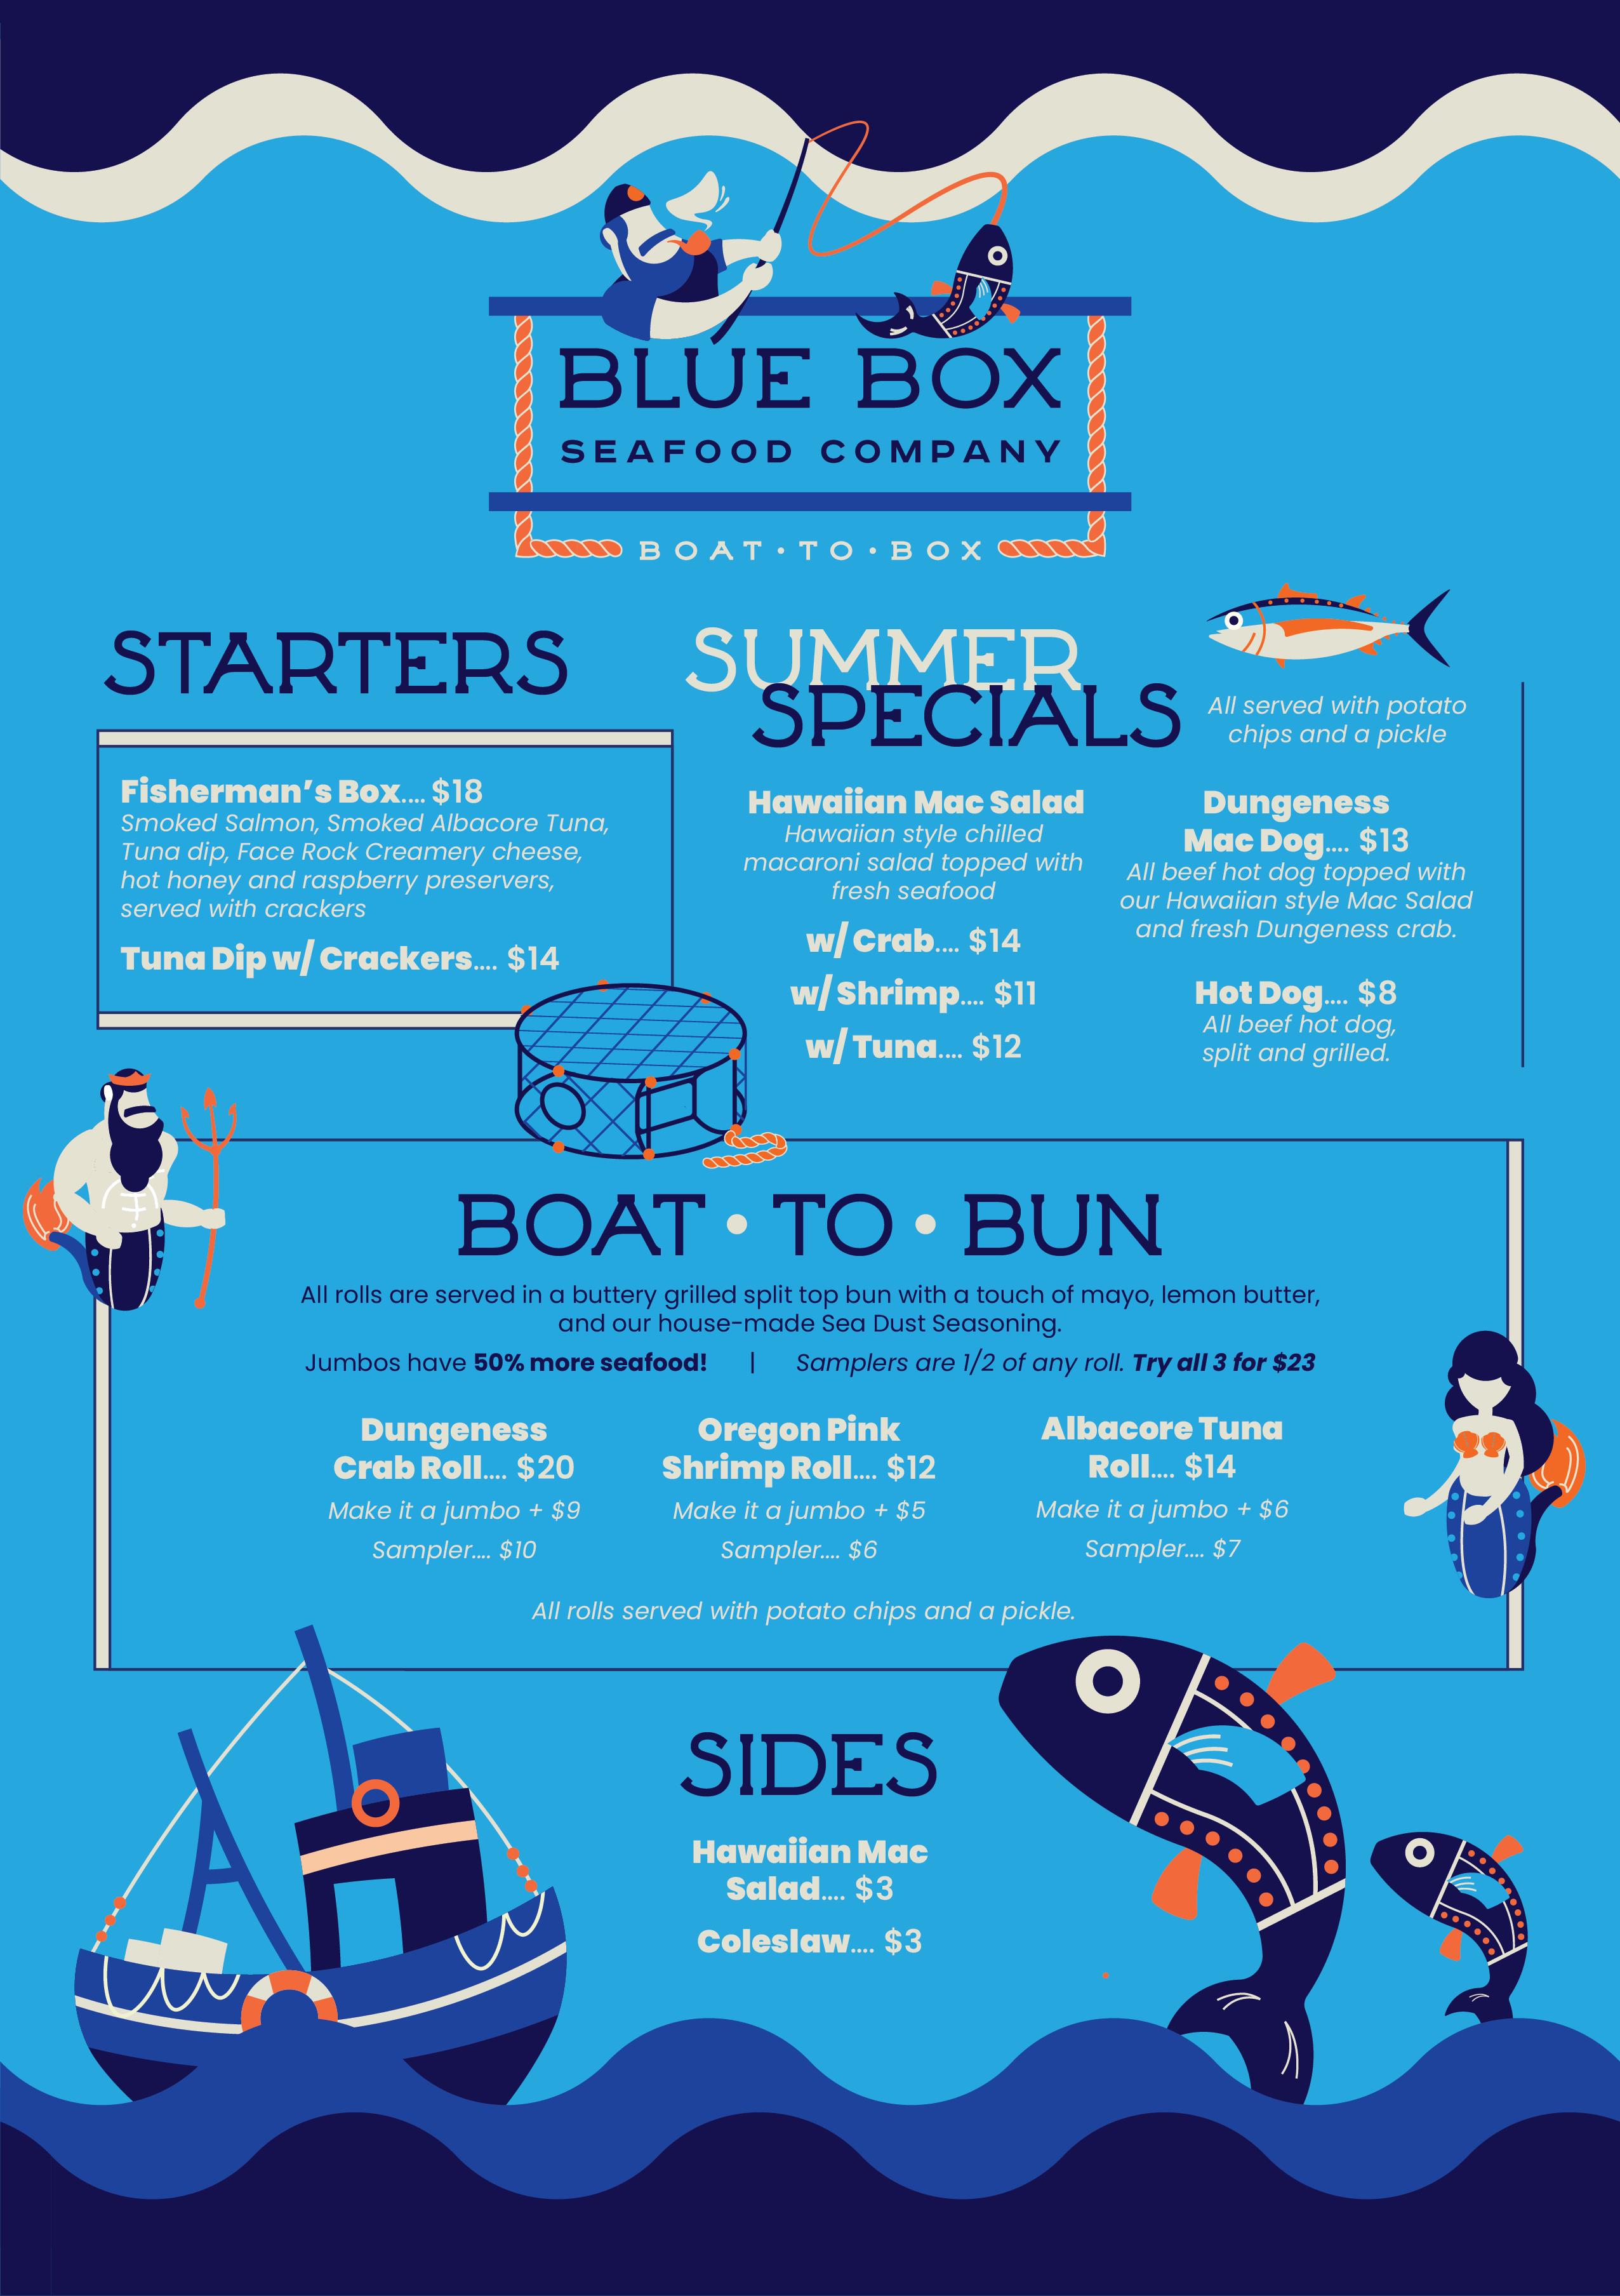 Blue Box Seafood Menu 2021